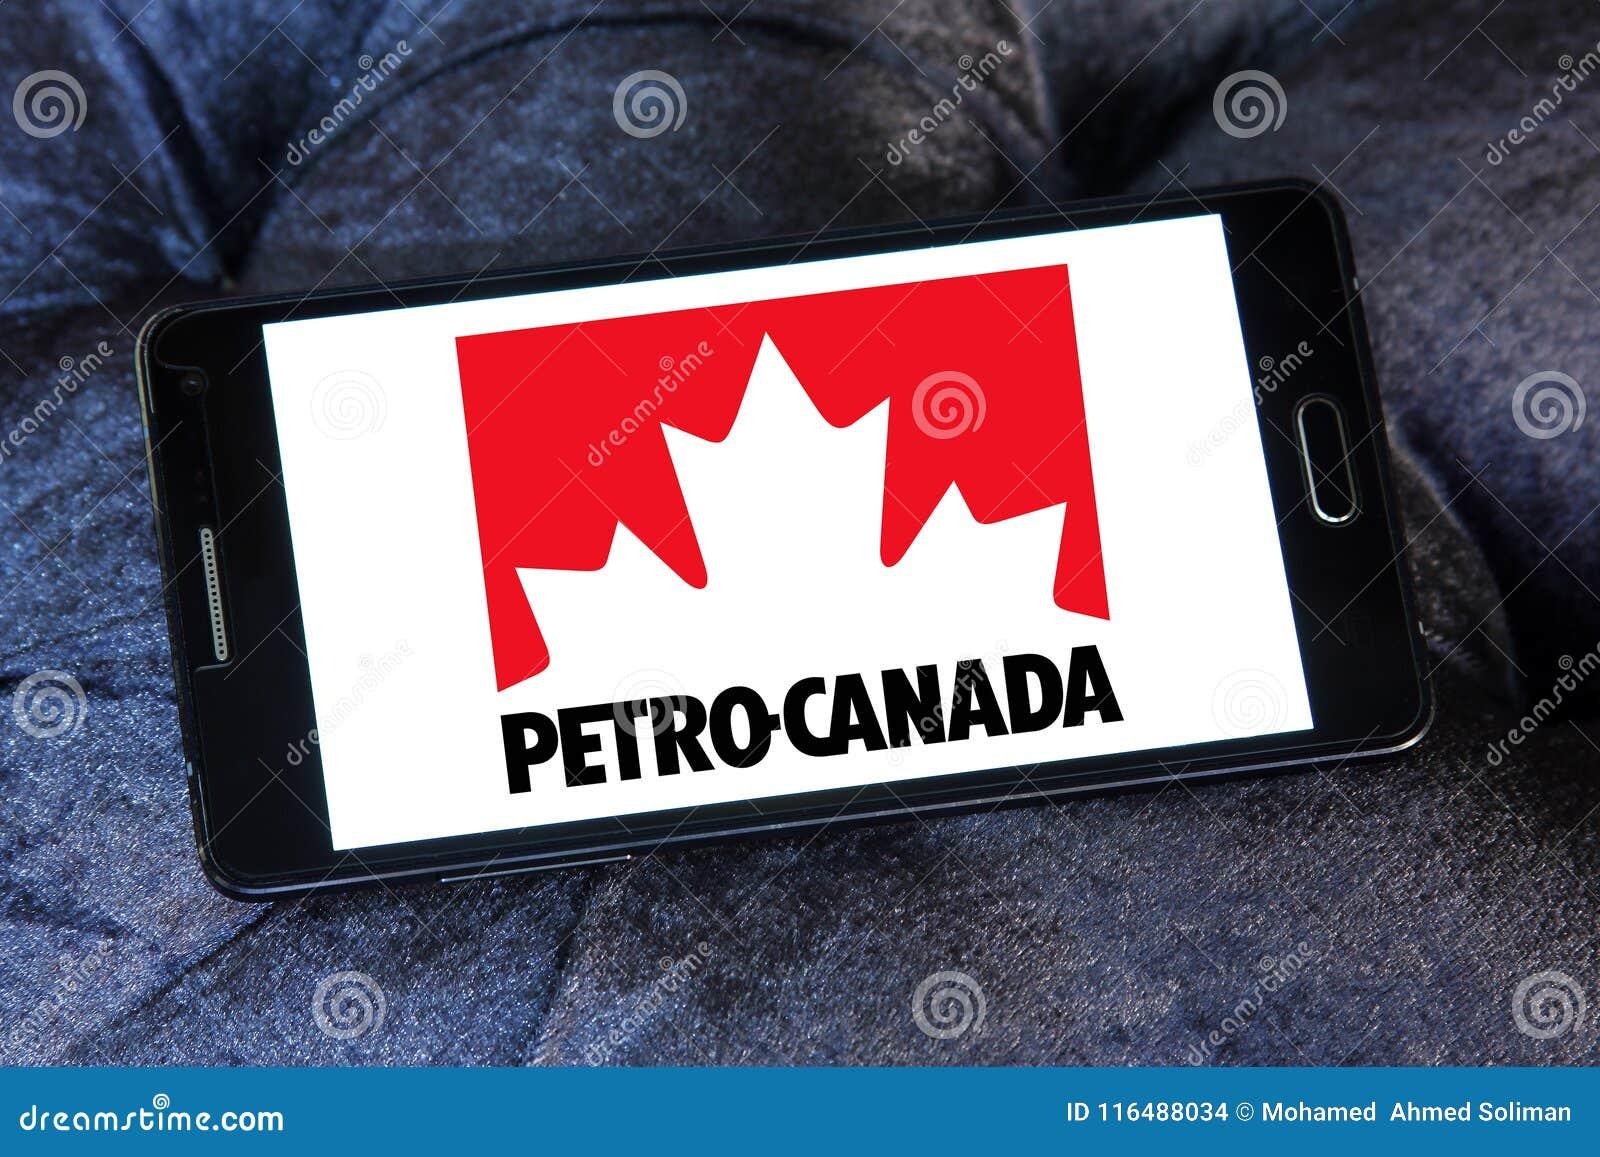 Petro Canada company logo editorial stock image  Image of